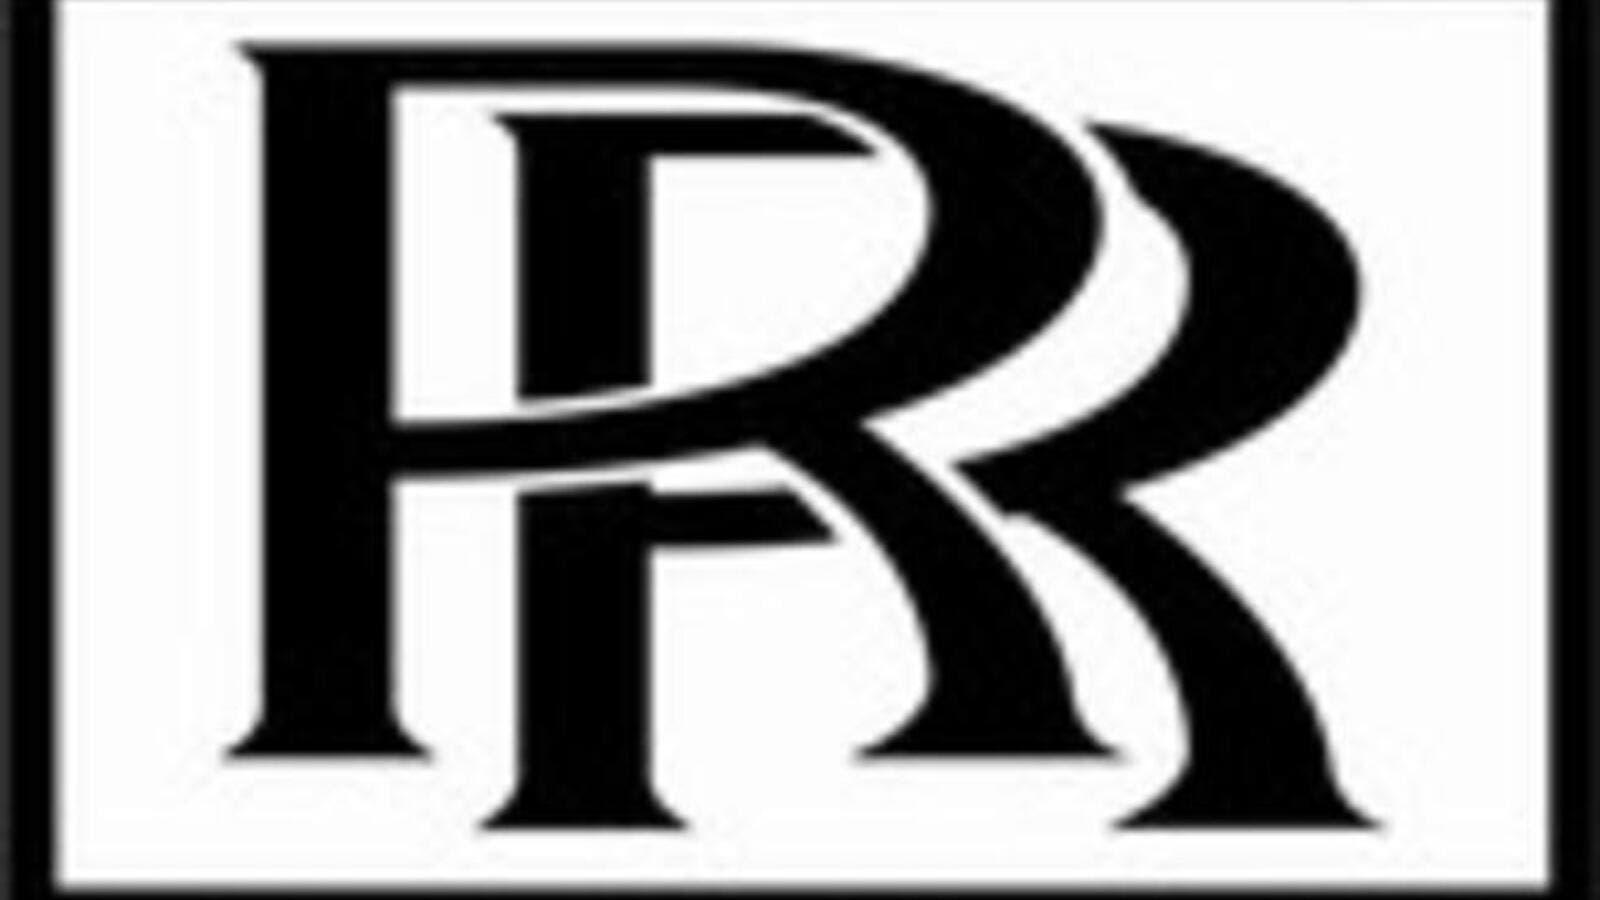 Rolls-Royce wins $40 million Trent 60 order for Sharjah